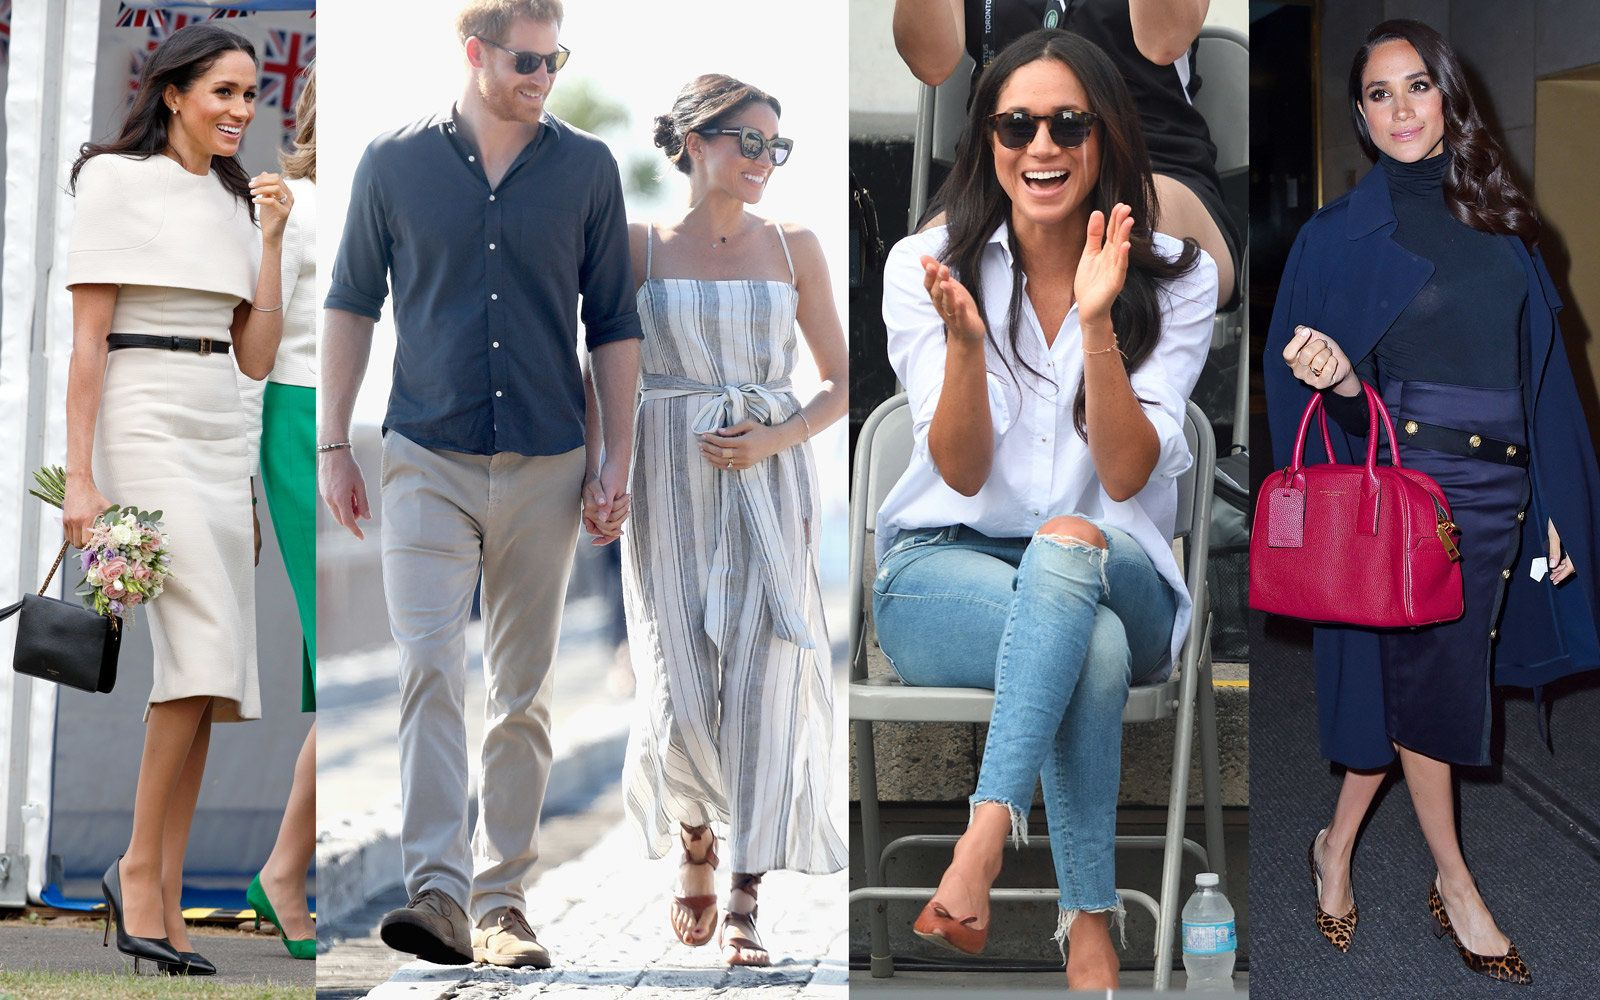 4 Line Fashion Favorit Meghan Markle, Bikin Bisnis Mereka Makin Maju